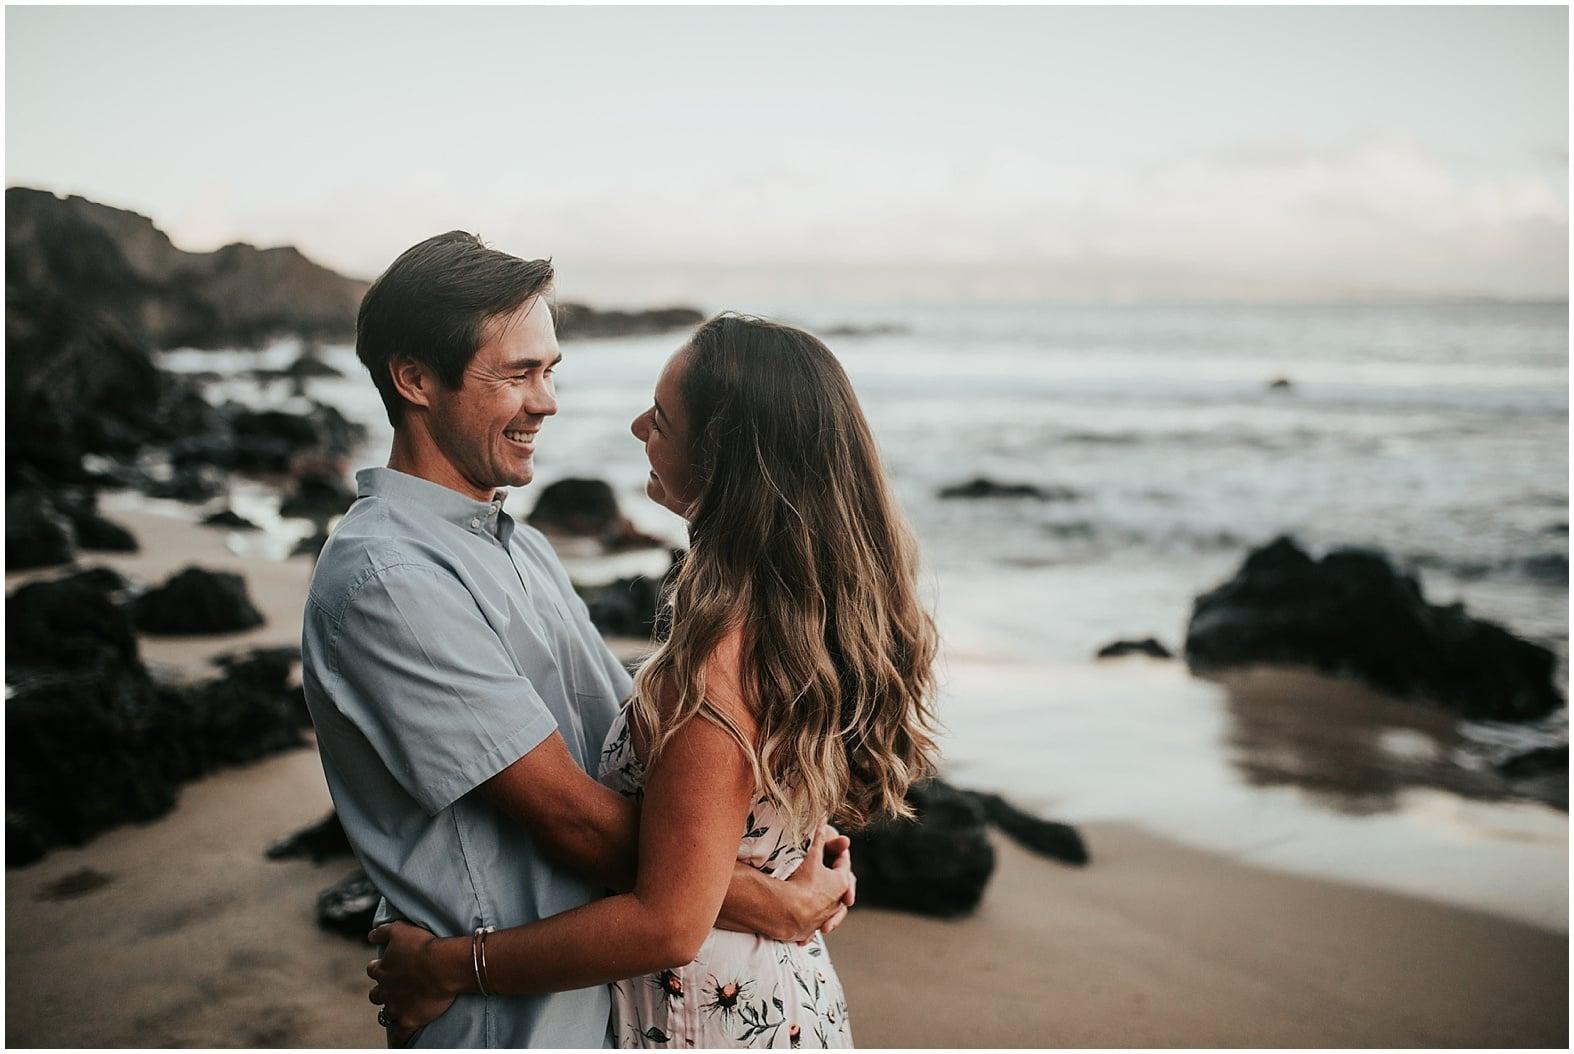 MAui engagement photography Rodrigo_Moraes_Photography4